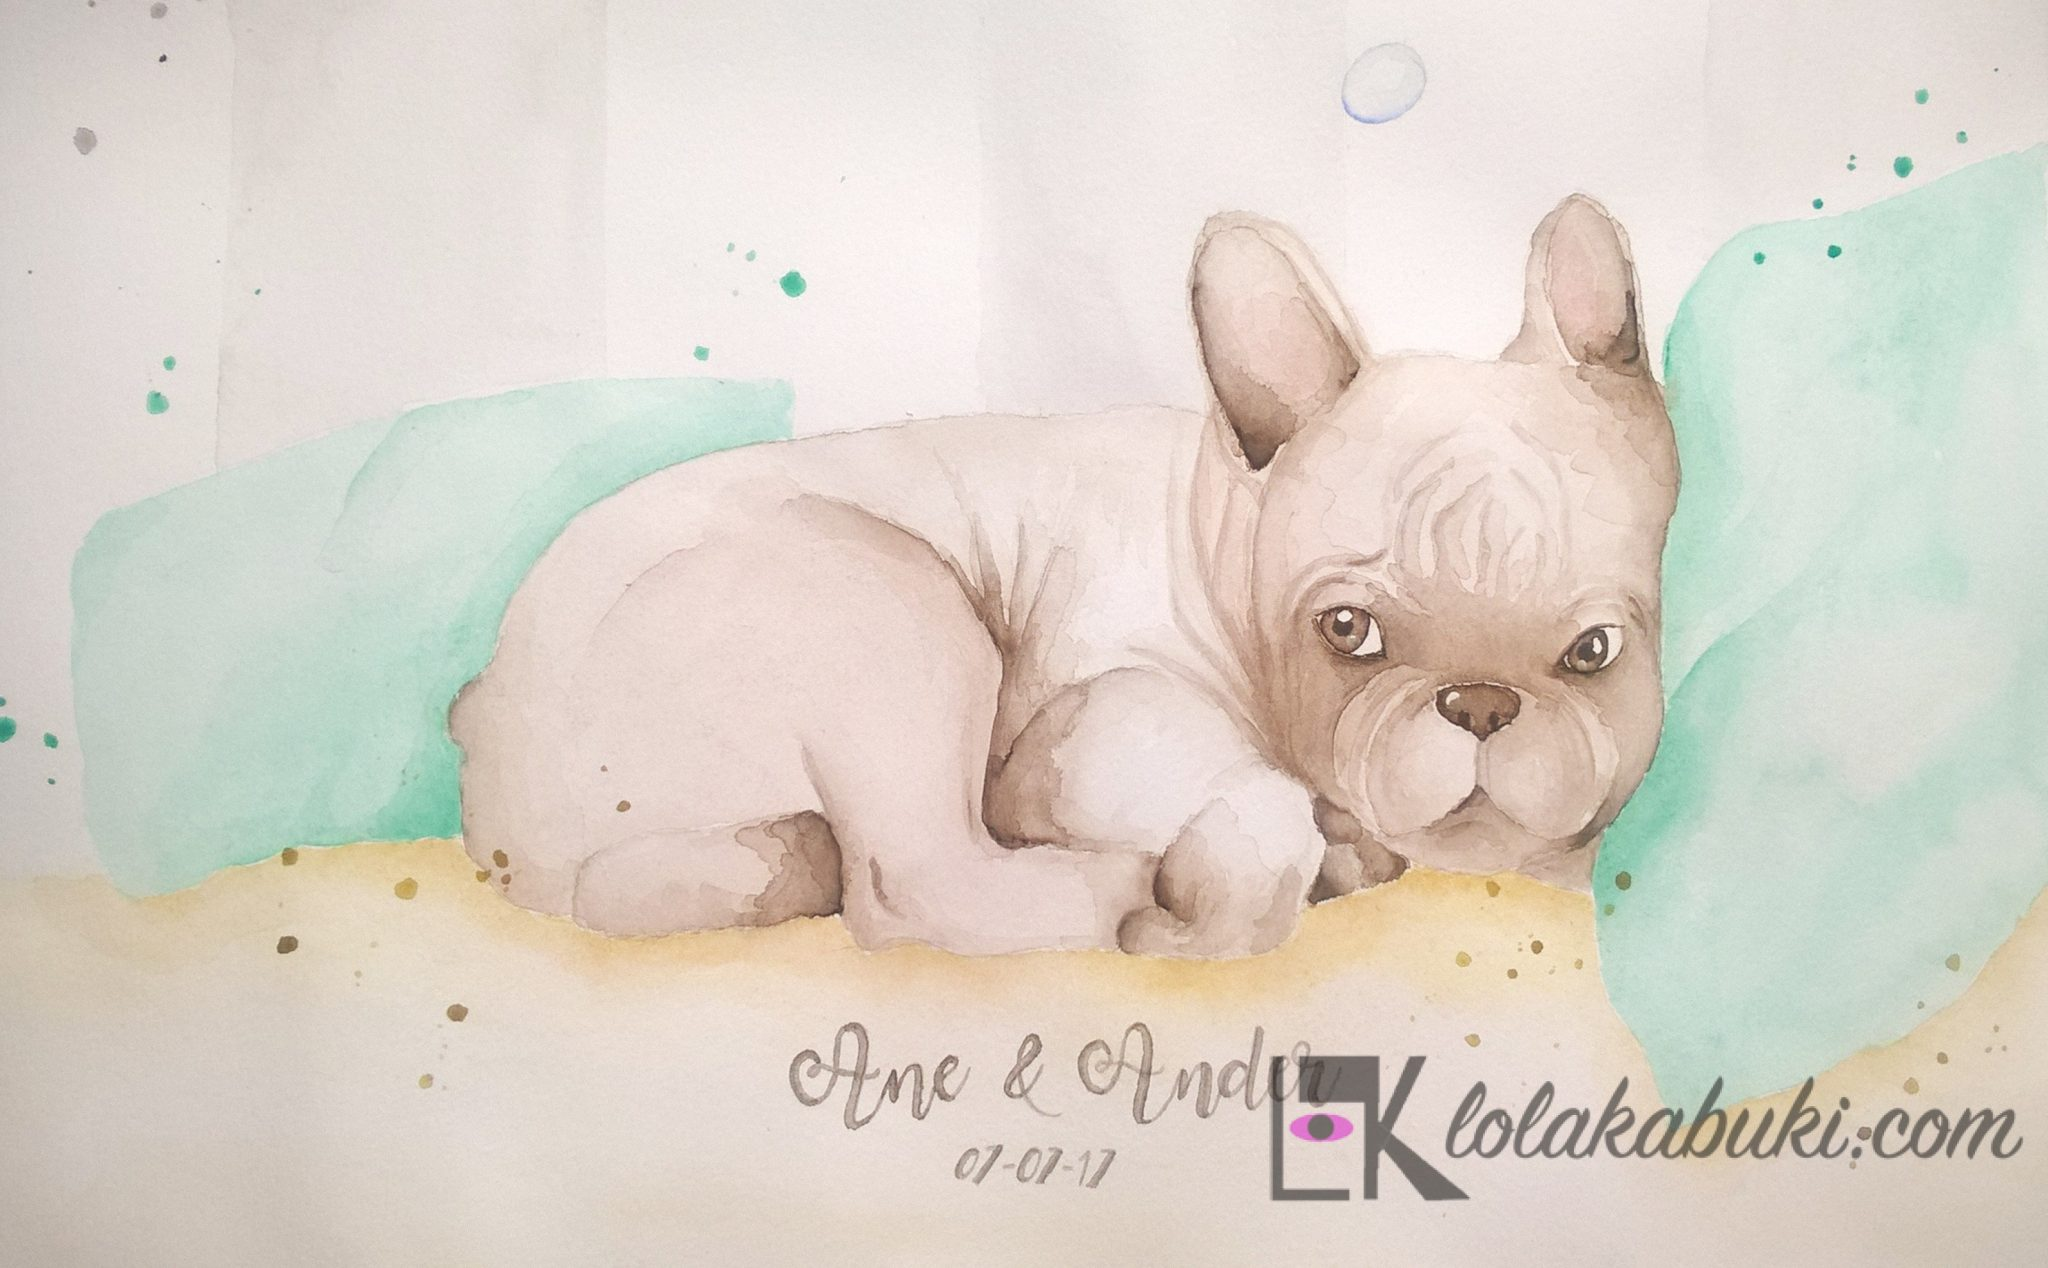 pintura de huellas mascotabulldog frances lola kabuki detalle (2)